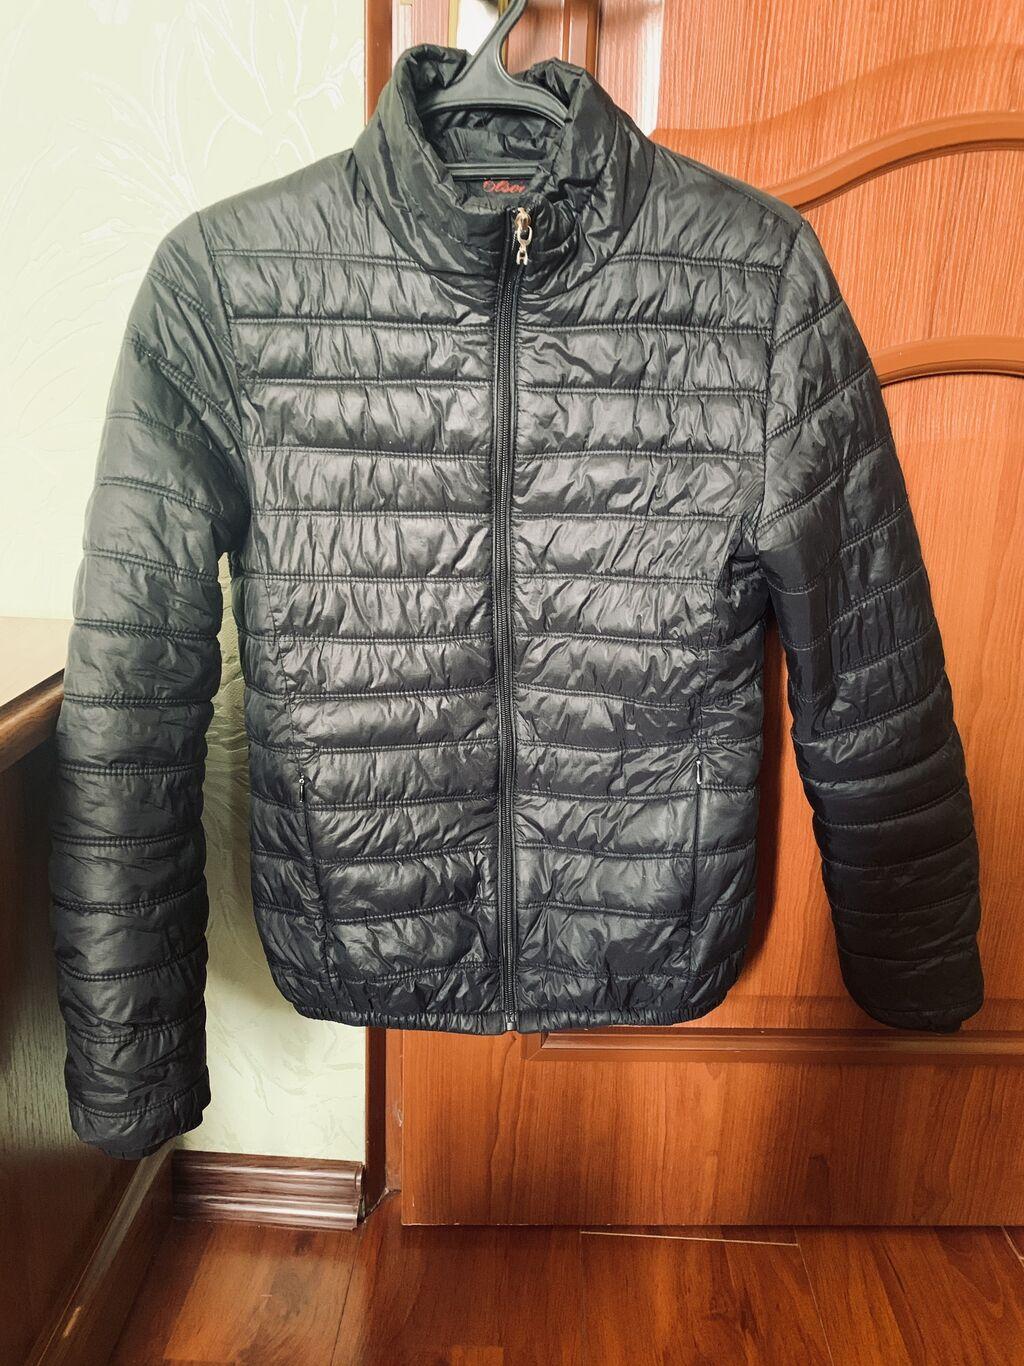 Продаю куртку лёгкую, размер x -xs: Продаю куртку лёгкую, размер x -xs